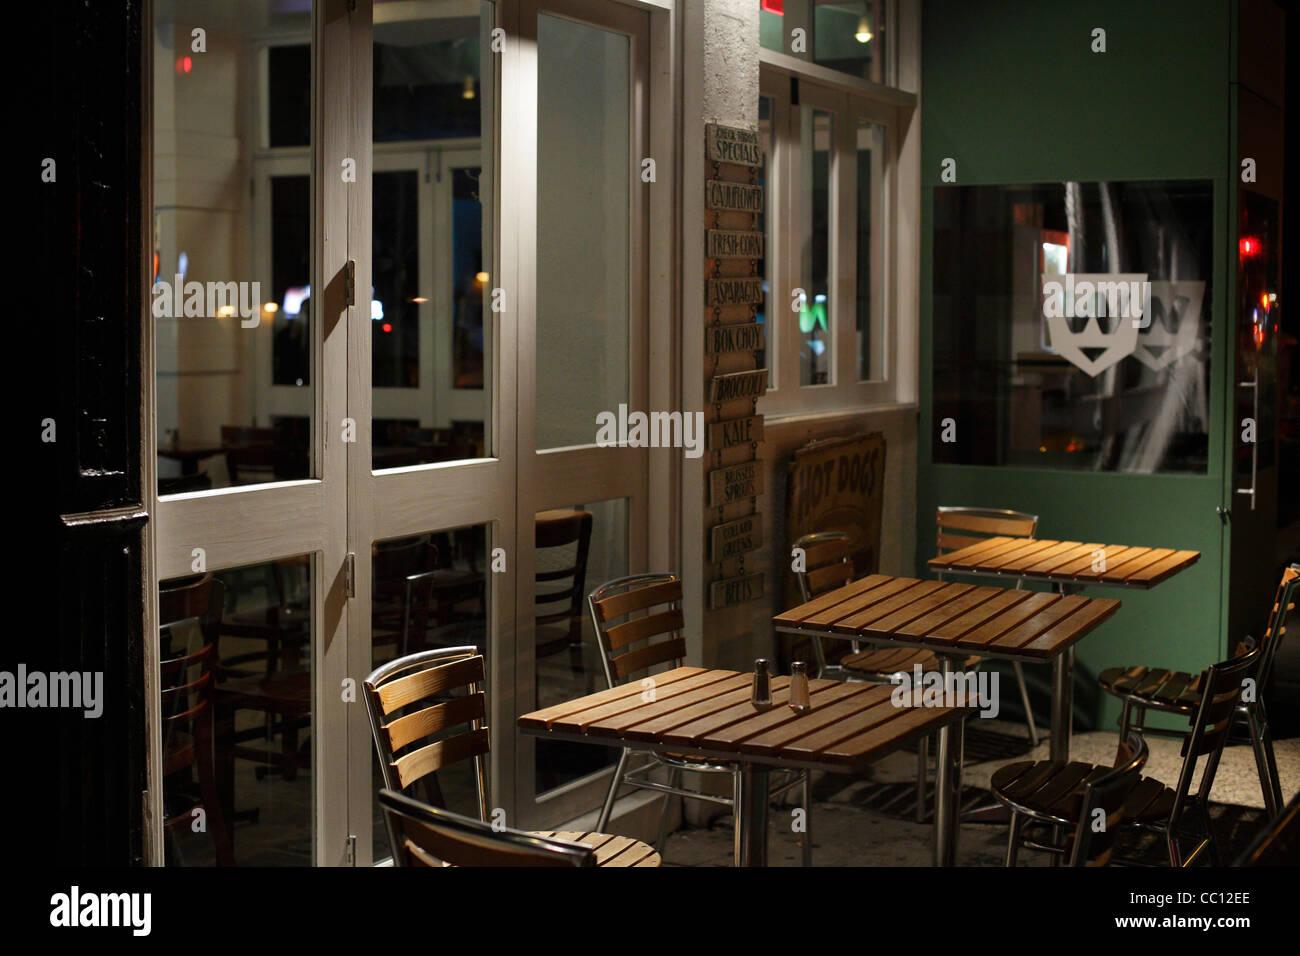 Sidewalk Cafe East Village New York - Stock Image